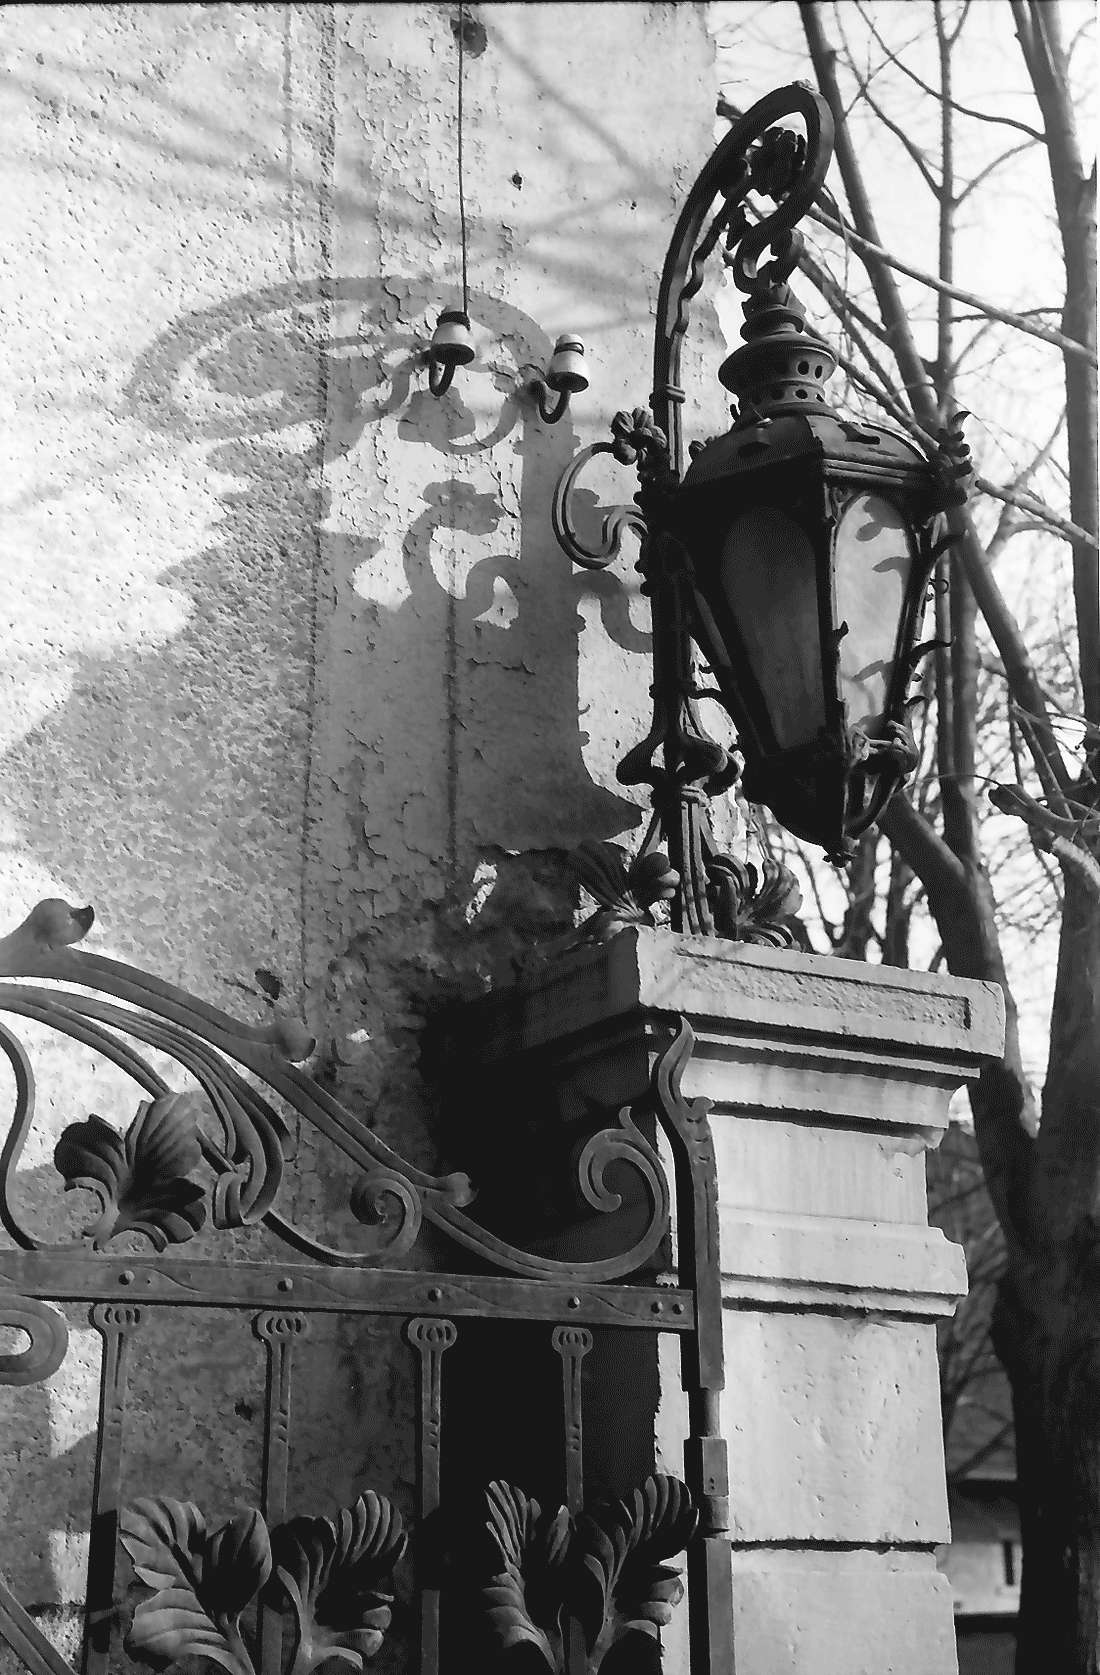 Feldkirch: Alte Laterne am Eingang, Bild 1